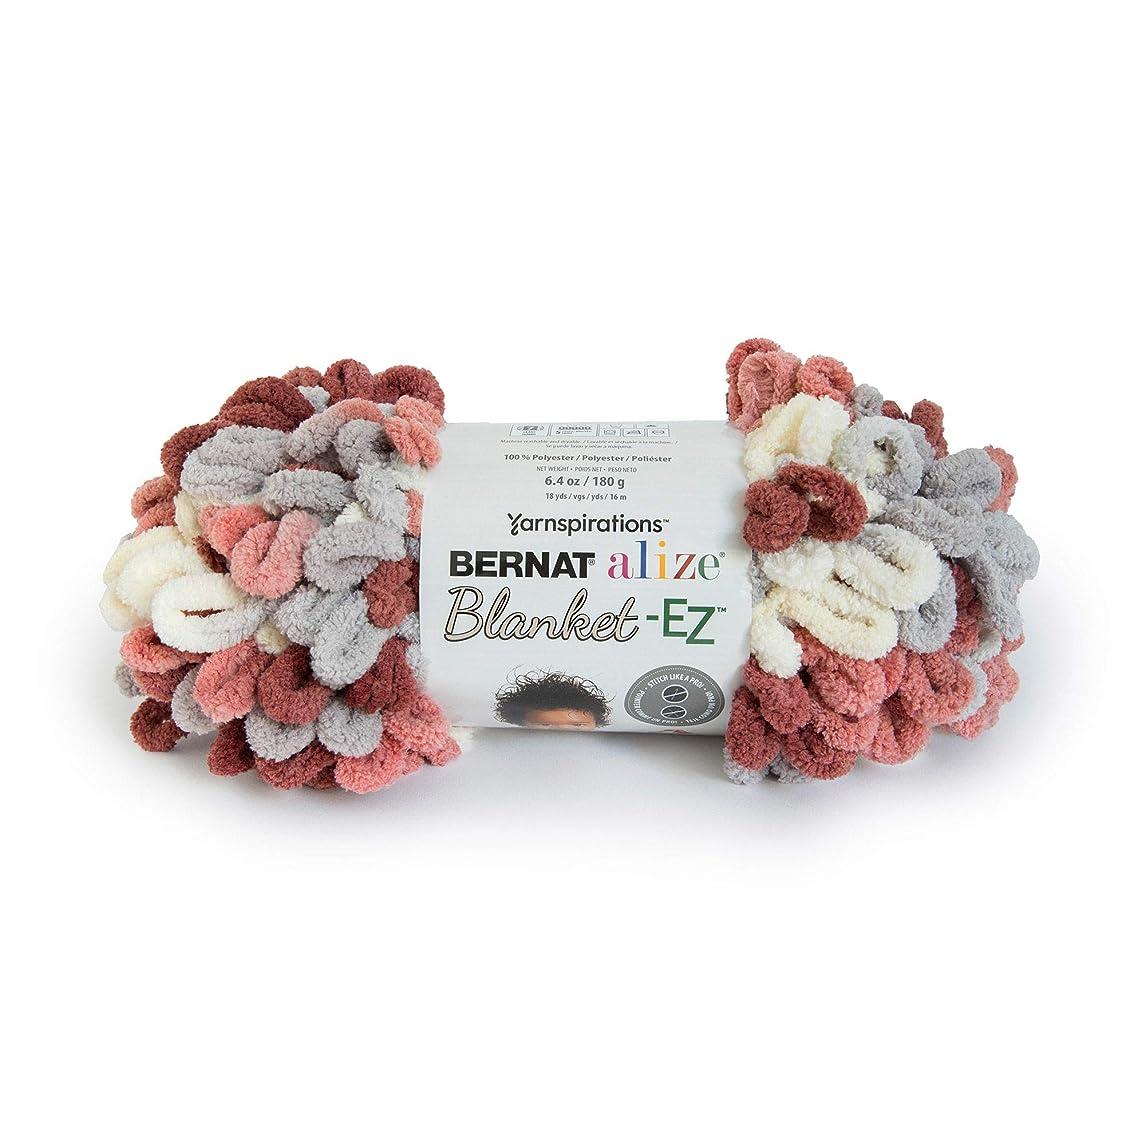 Bernat 16103737022 Alize Blanket-EZ Yarn, Warm Clay